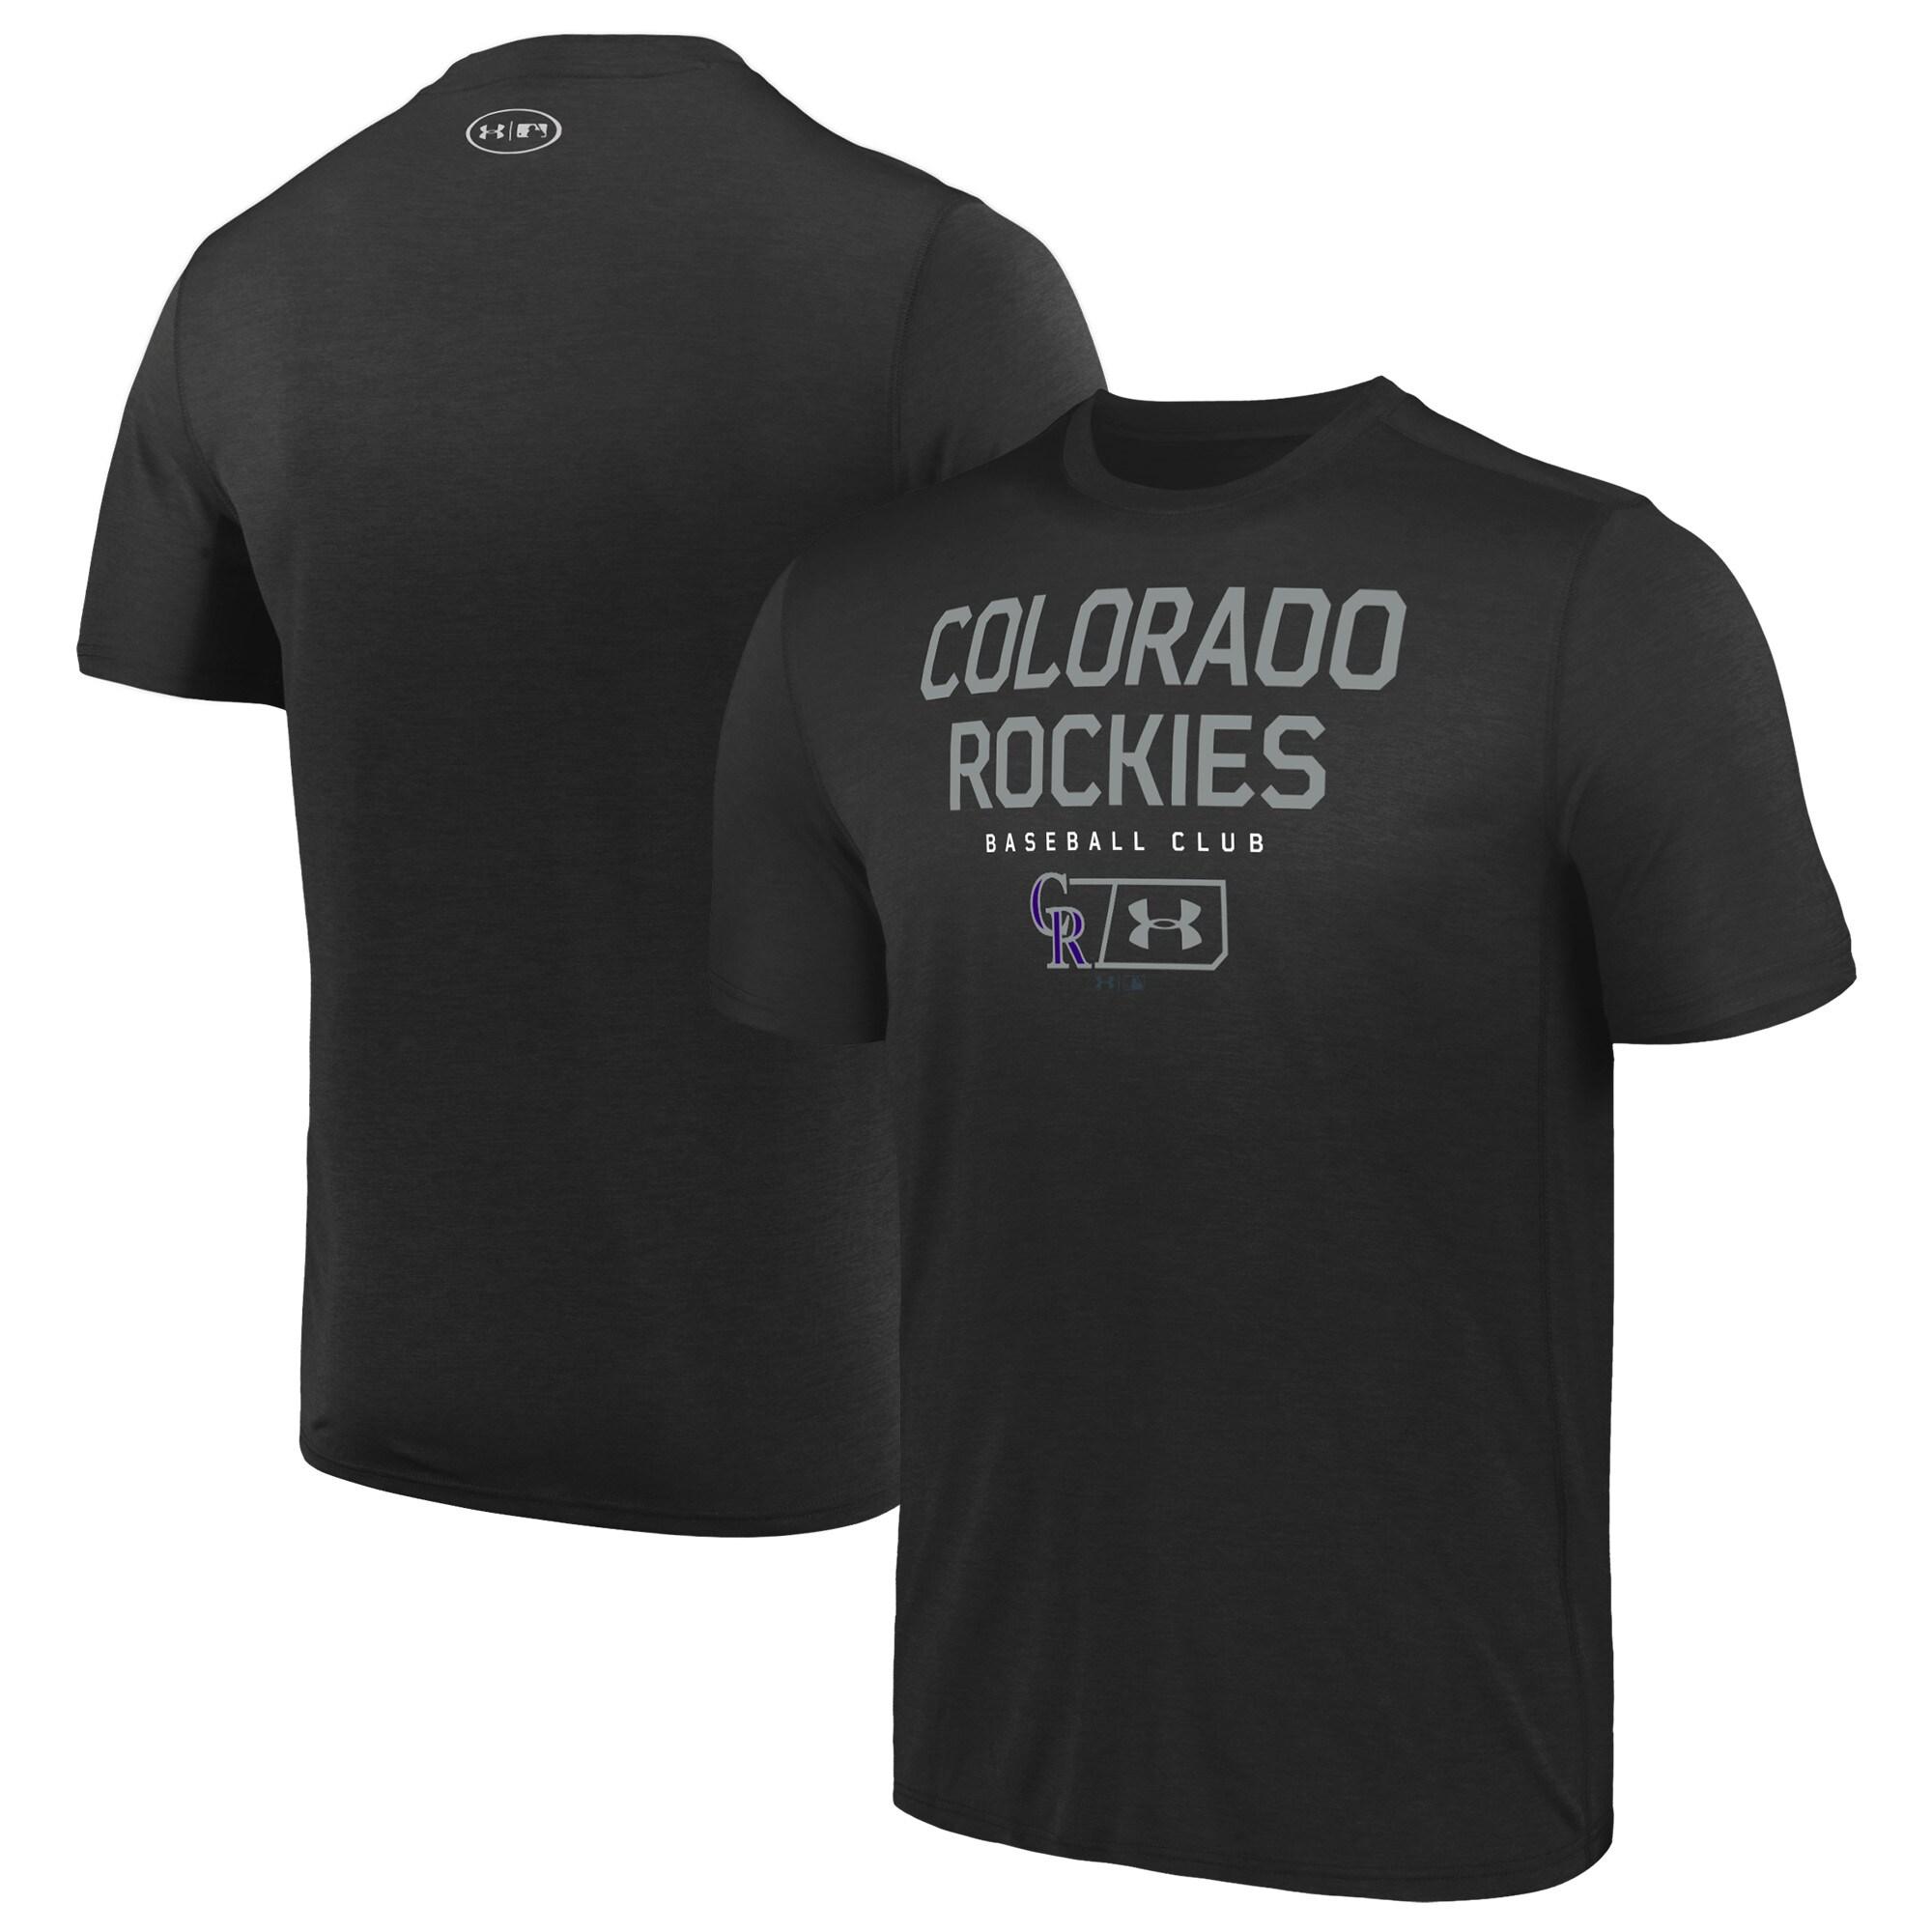 Colorado Rockies Under Armour City Proud Performance T-Shirt - Black